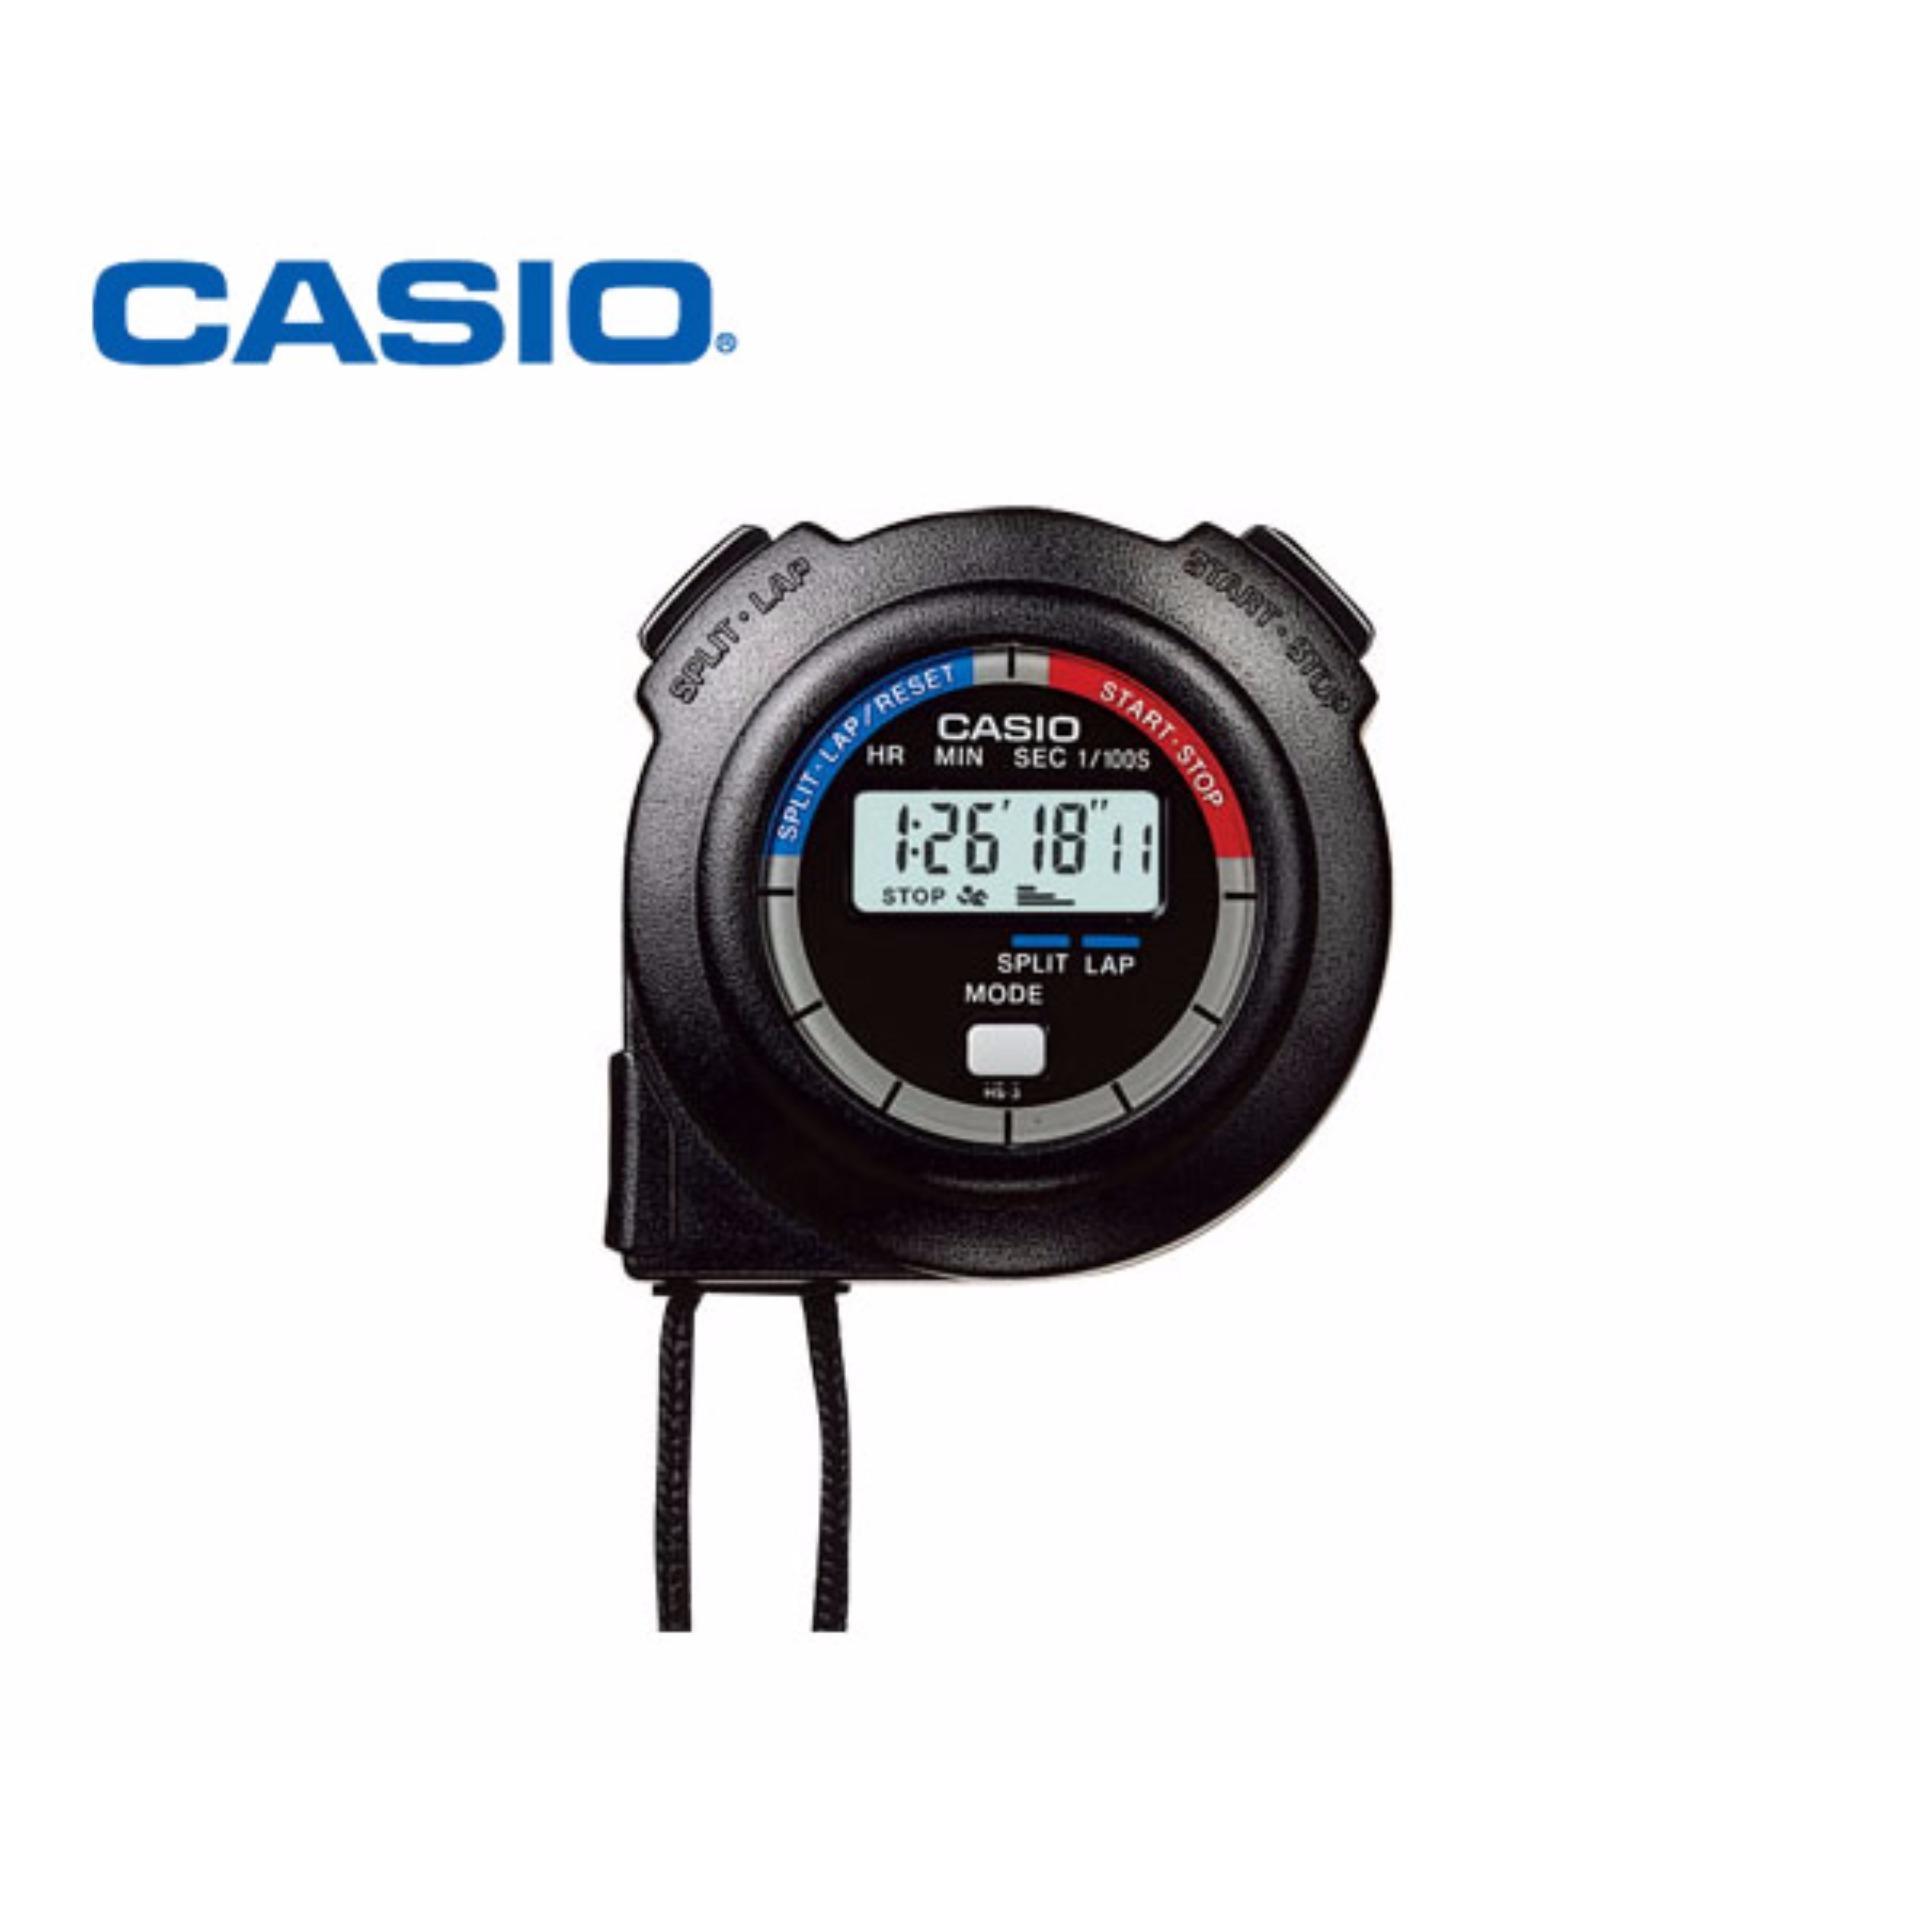 Stopwatch Casio HS-3V Digital - Stop Watch Casio